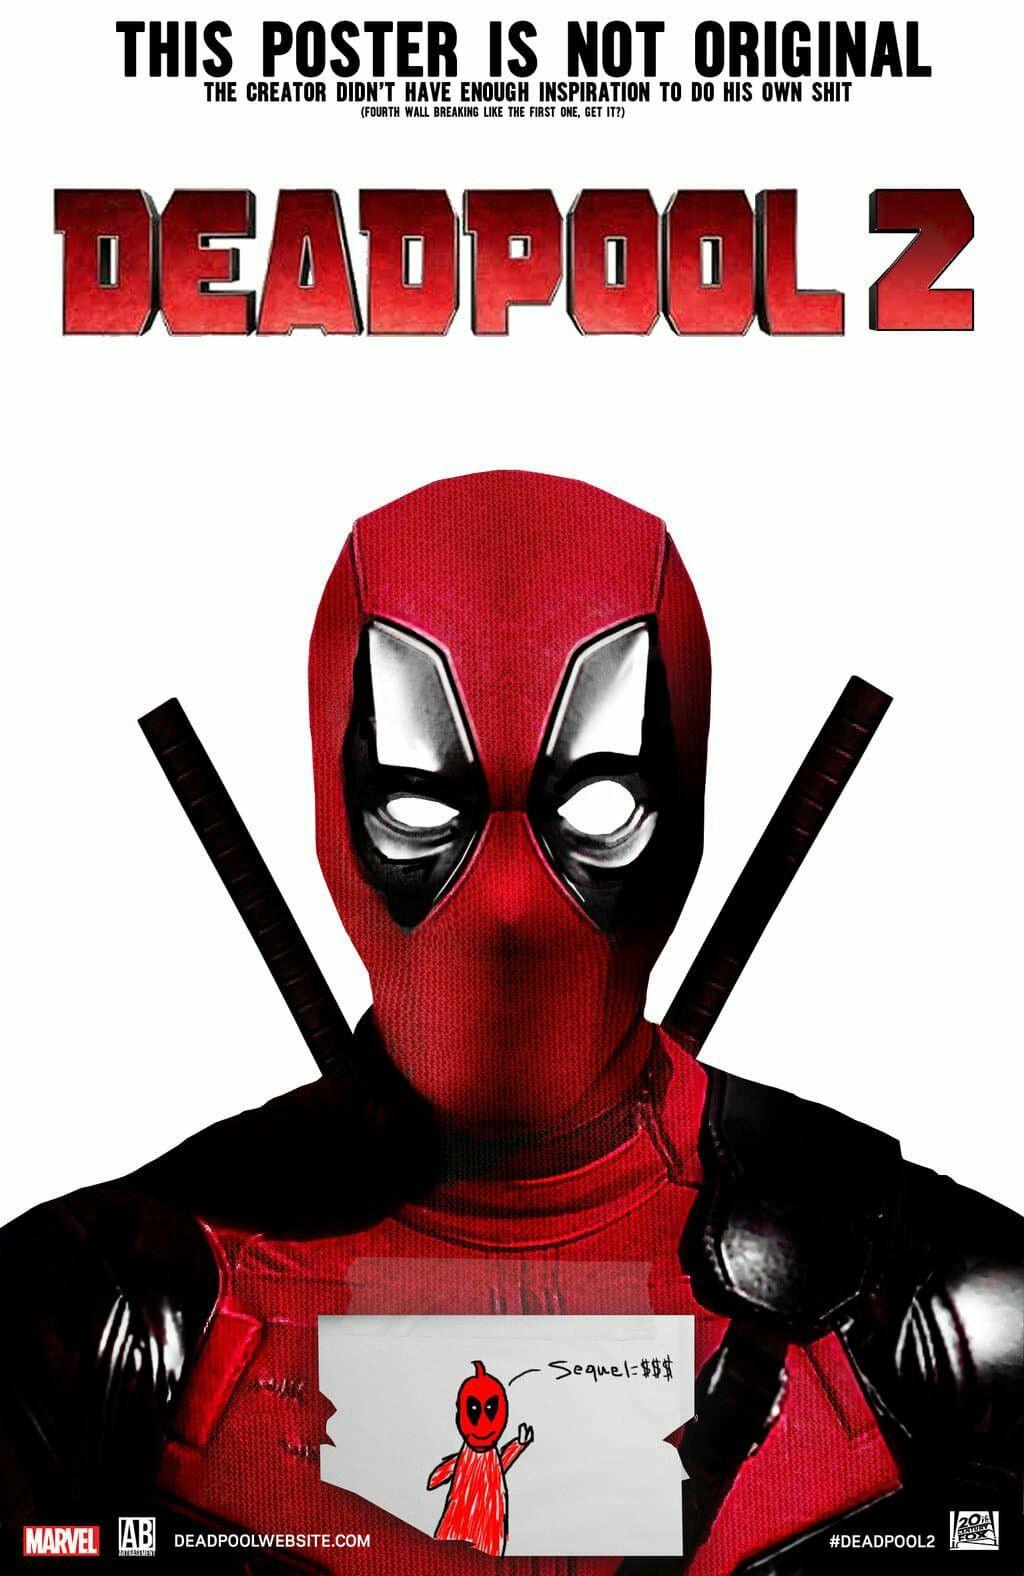 Deadpool 2 Movie Posters Artwork Movieposters Moviereview Movietalk Movietwit Moviebuff Deadpool Comics Ganze Filme Deadpool Ganze Filme Kostenlos